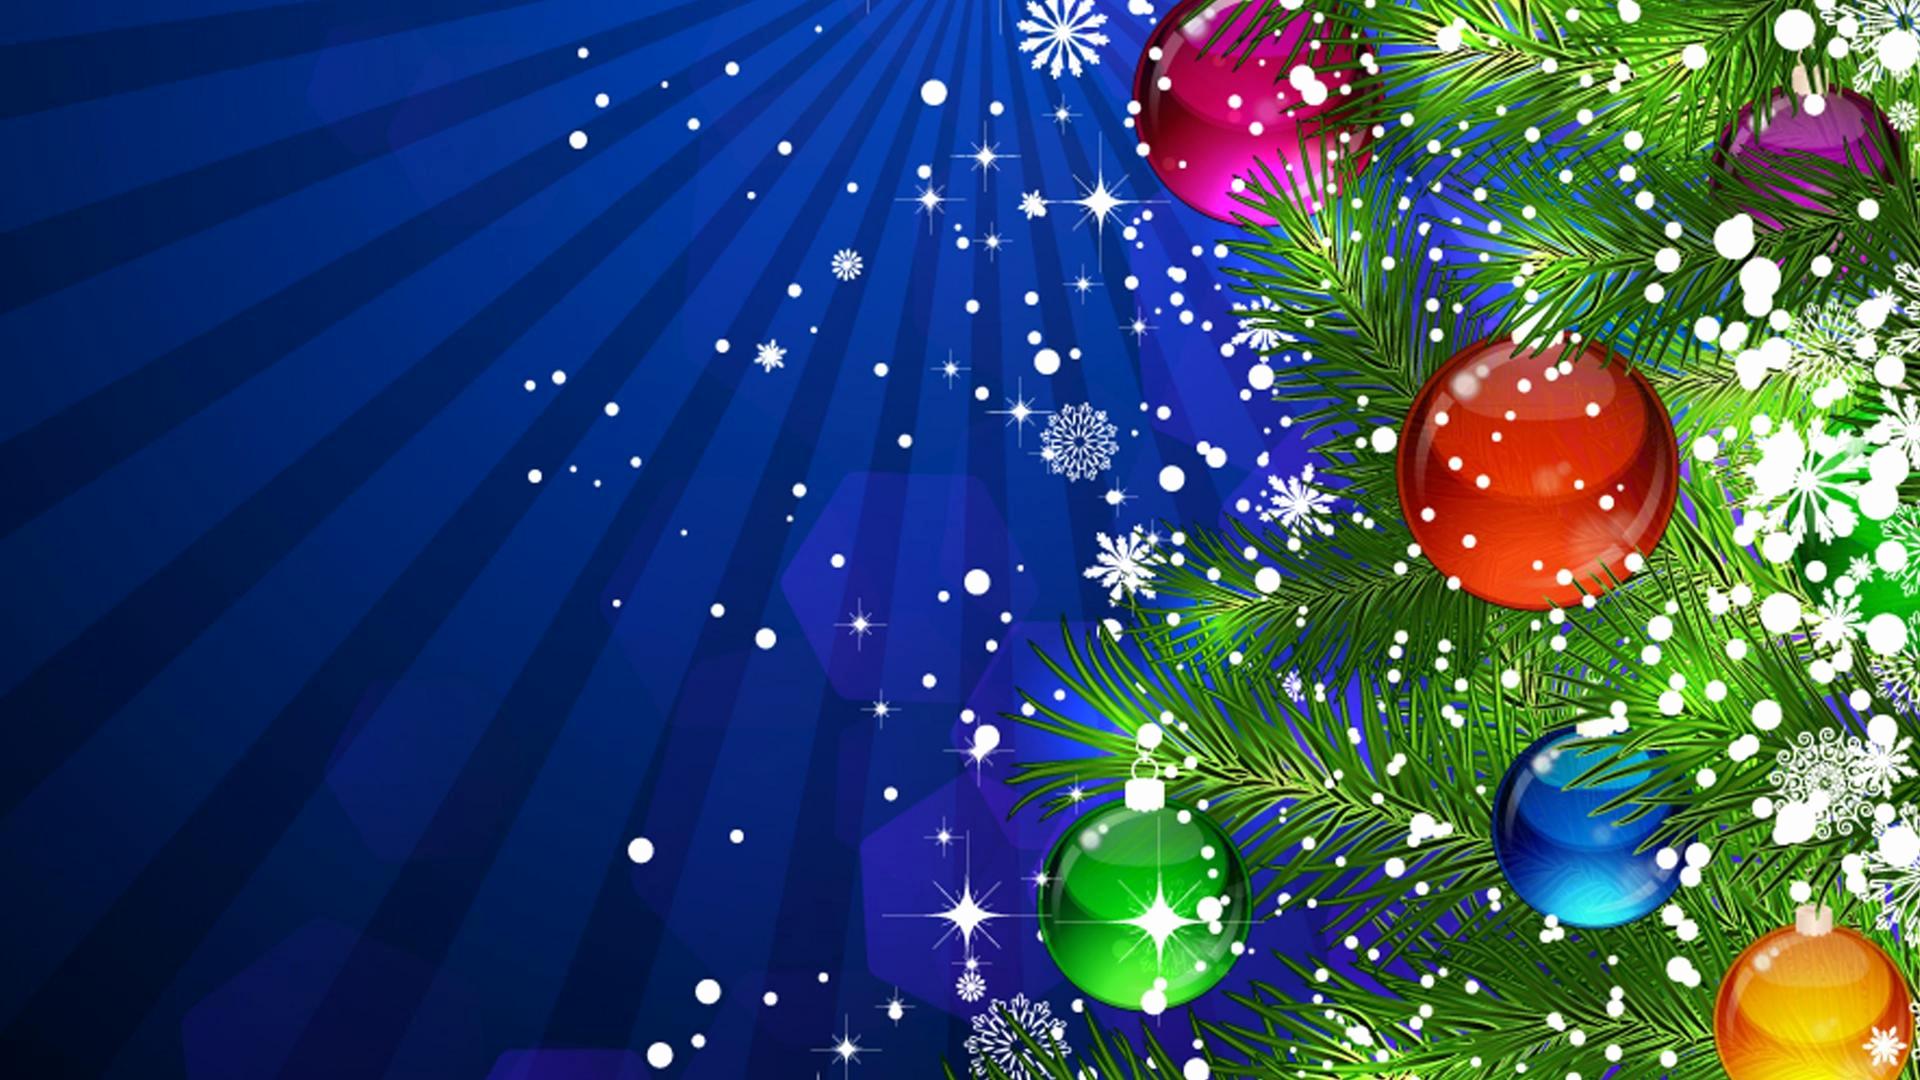 Free Christmas Desktop Wallpaper Lovely Merry Christmas Wallpaper Free Download